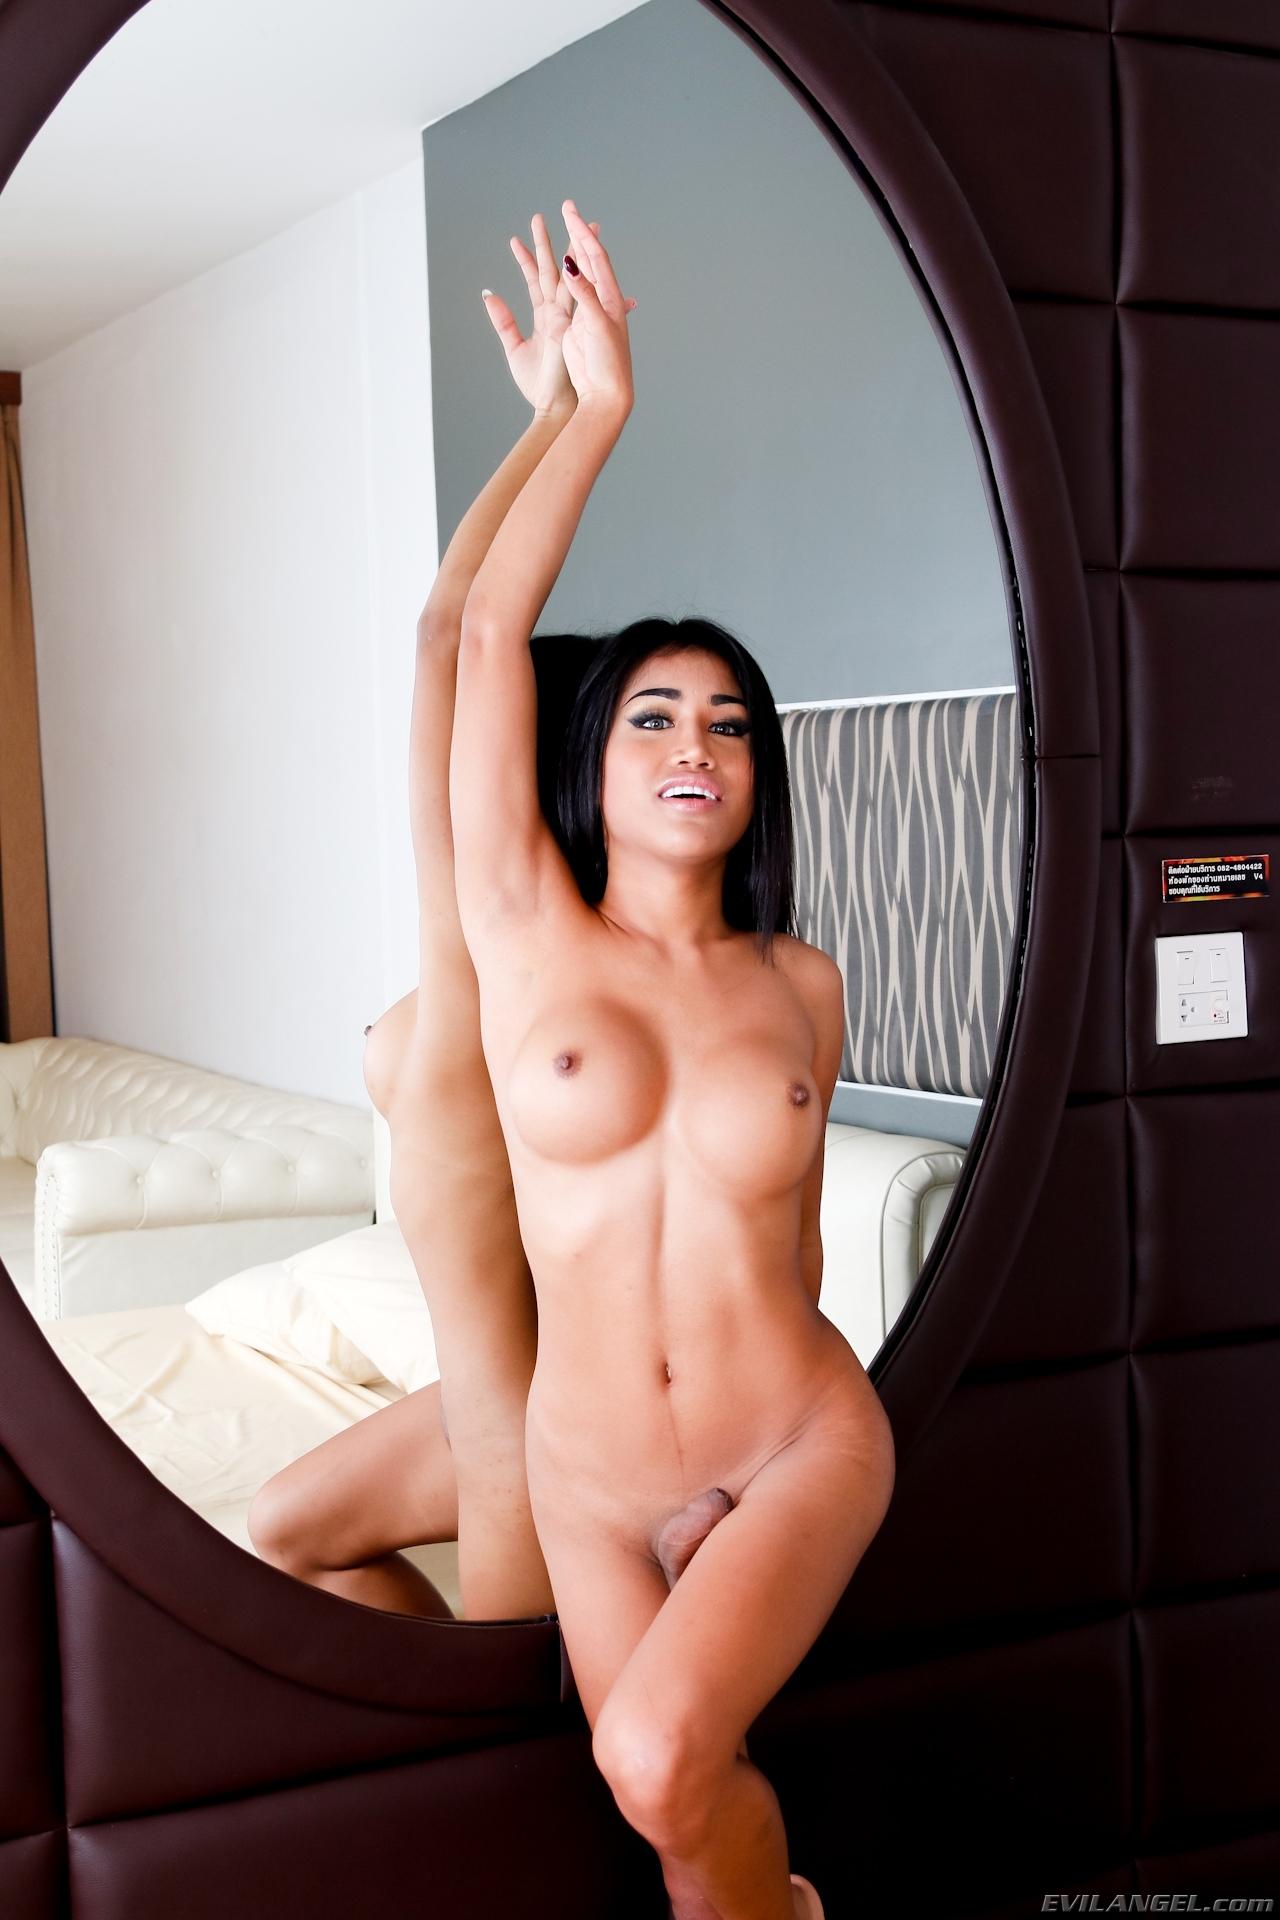 Alisa C Ladyboy, She Is Just So Seductive And Flirtatious